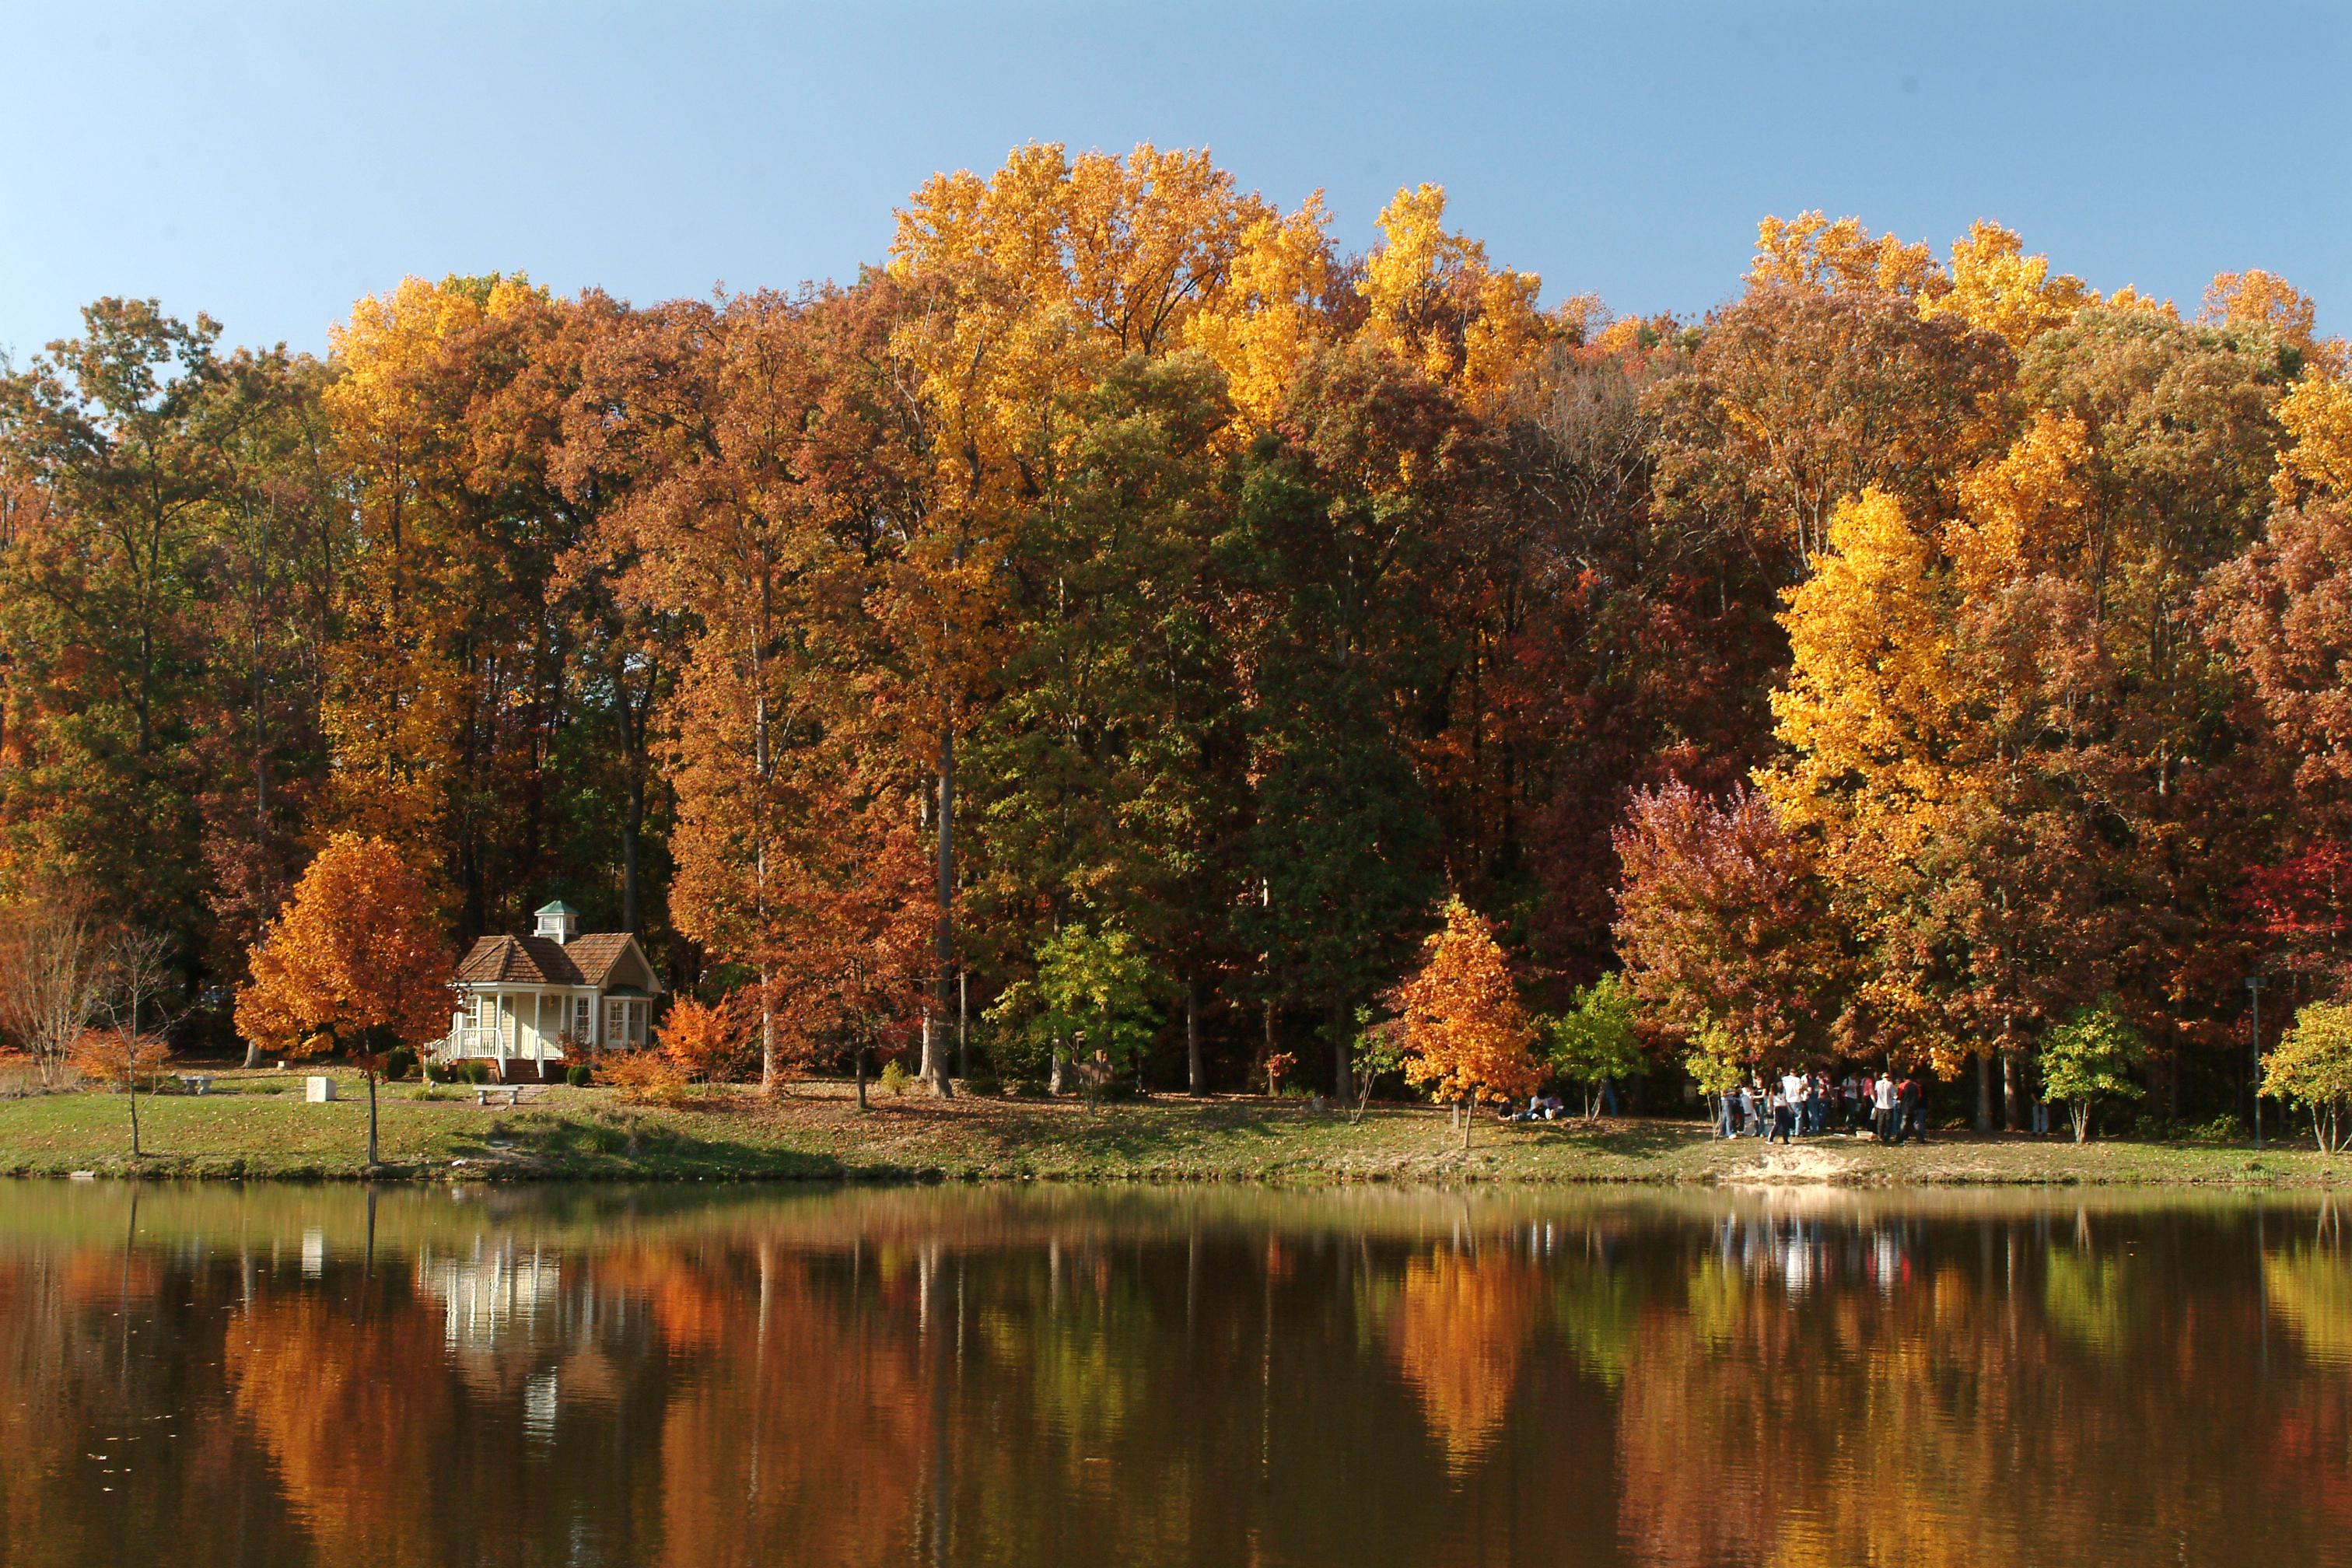 Pond - Fall